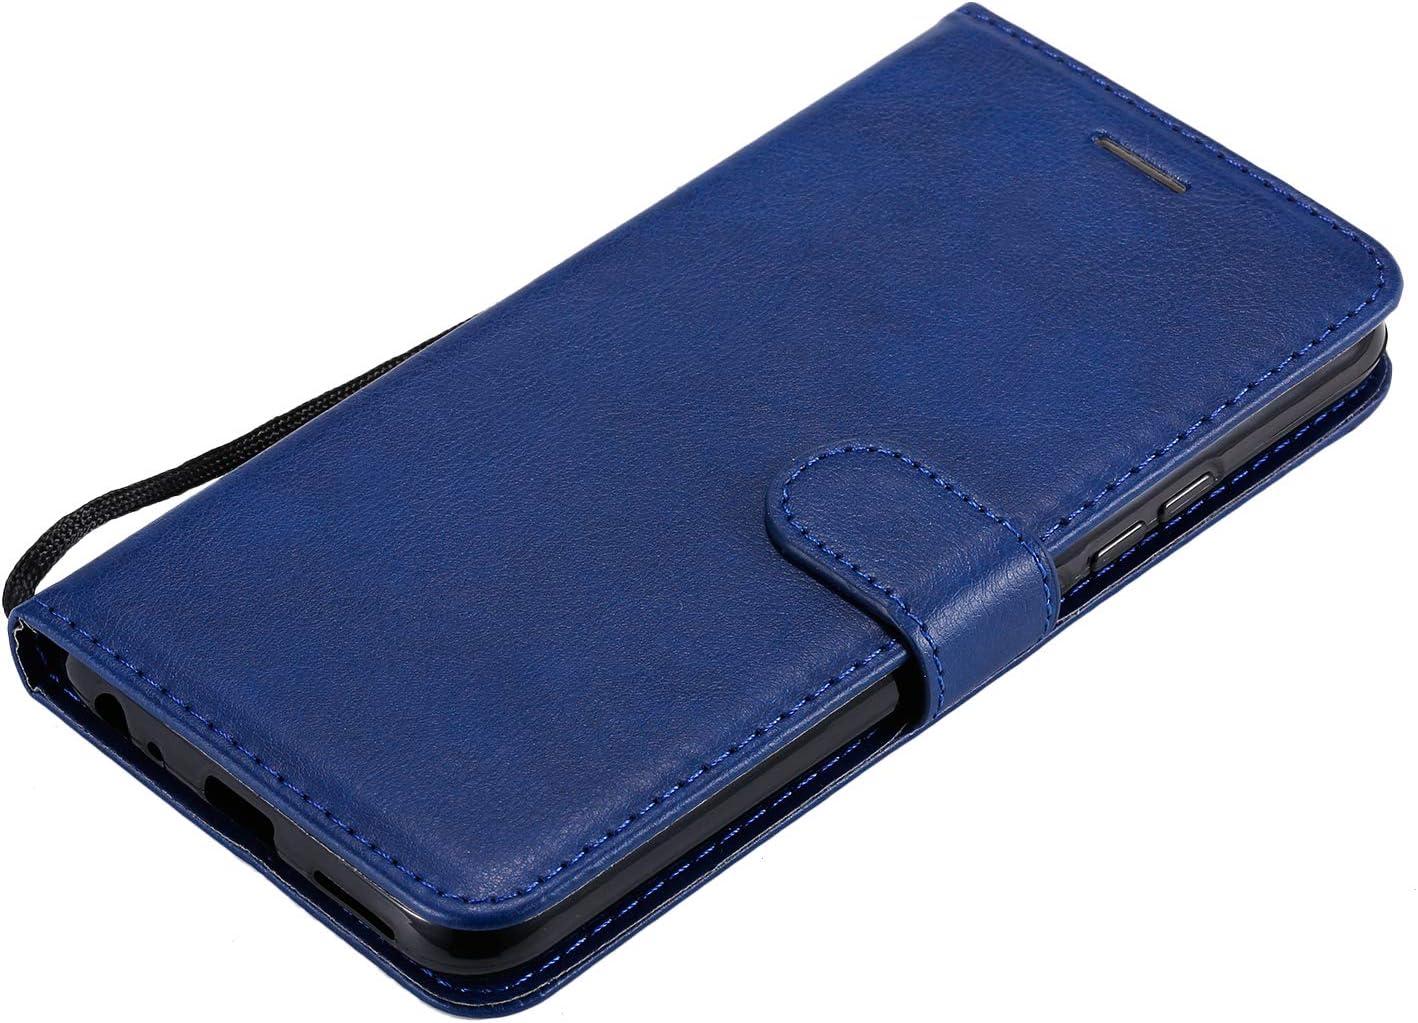 TOKTU100640 Blau Brieftasche Handyh/ülle Klapph/ülle mit Kartenhalter Stossfest Lederh/ülle f/ür Vivo Y15 Tosim Vivo Y15//Y17//Y12//U10//Y3 H/ülle Klappbar Leder